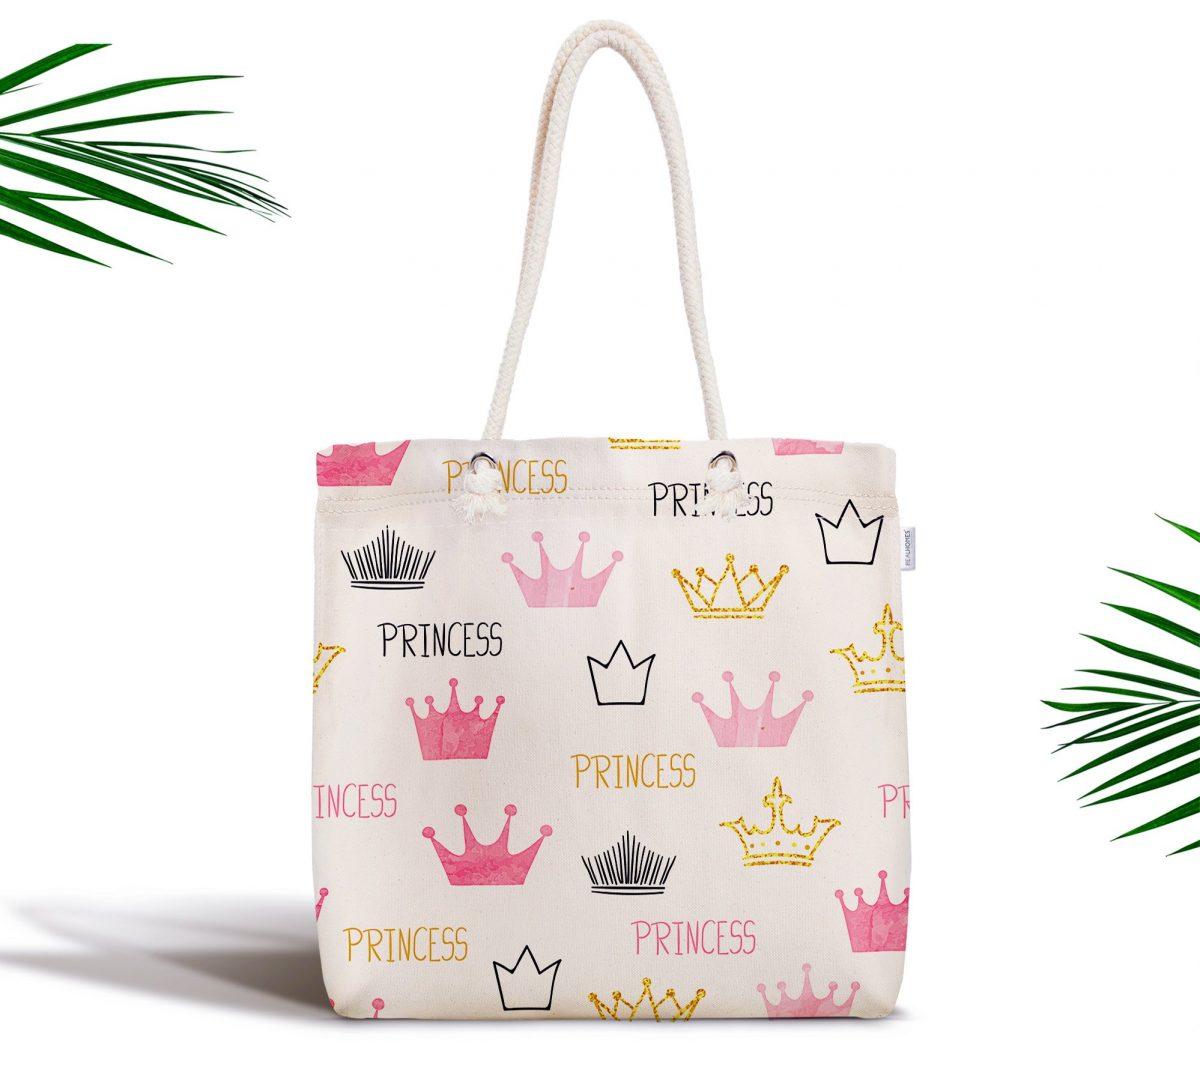 Pudra Renk Prenses Taç Motifli Dijital Baskılı Fermuarlı Kumaş Çanta Realhomes